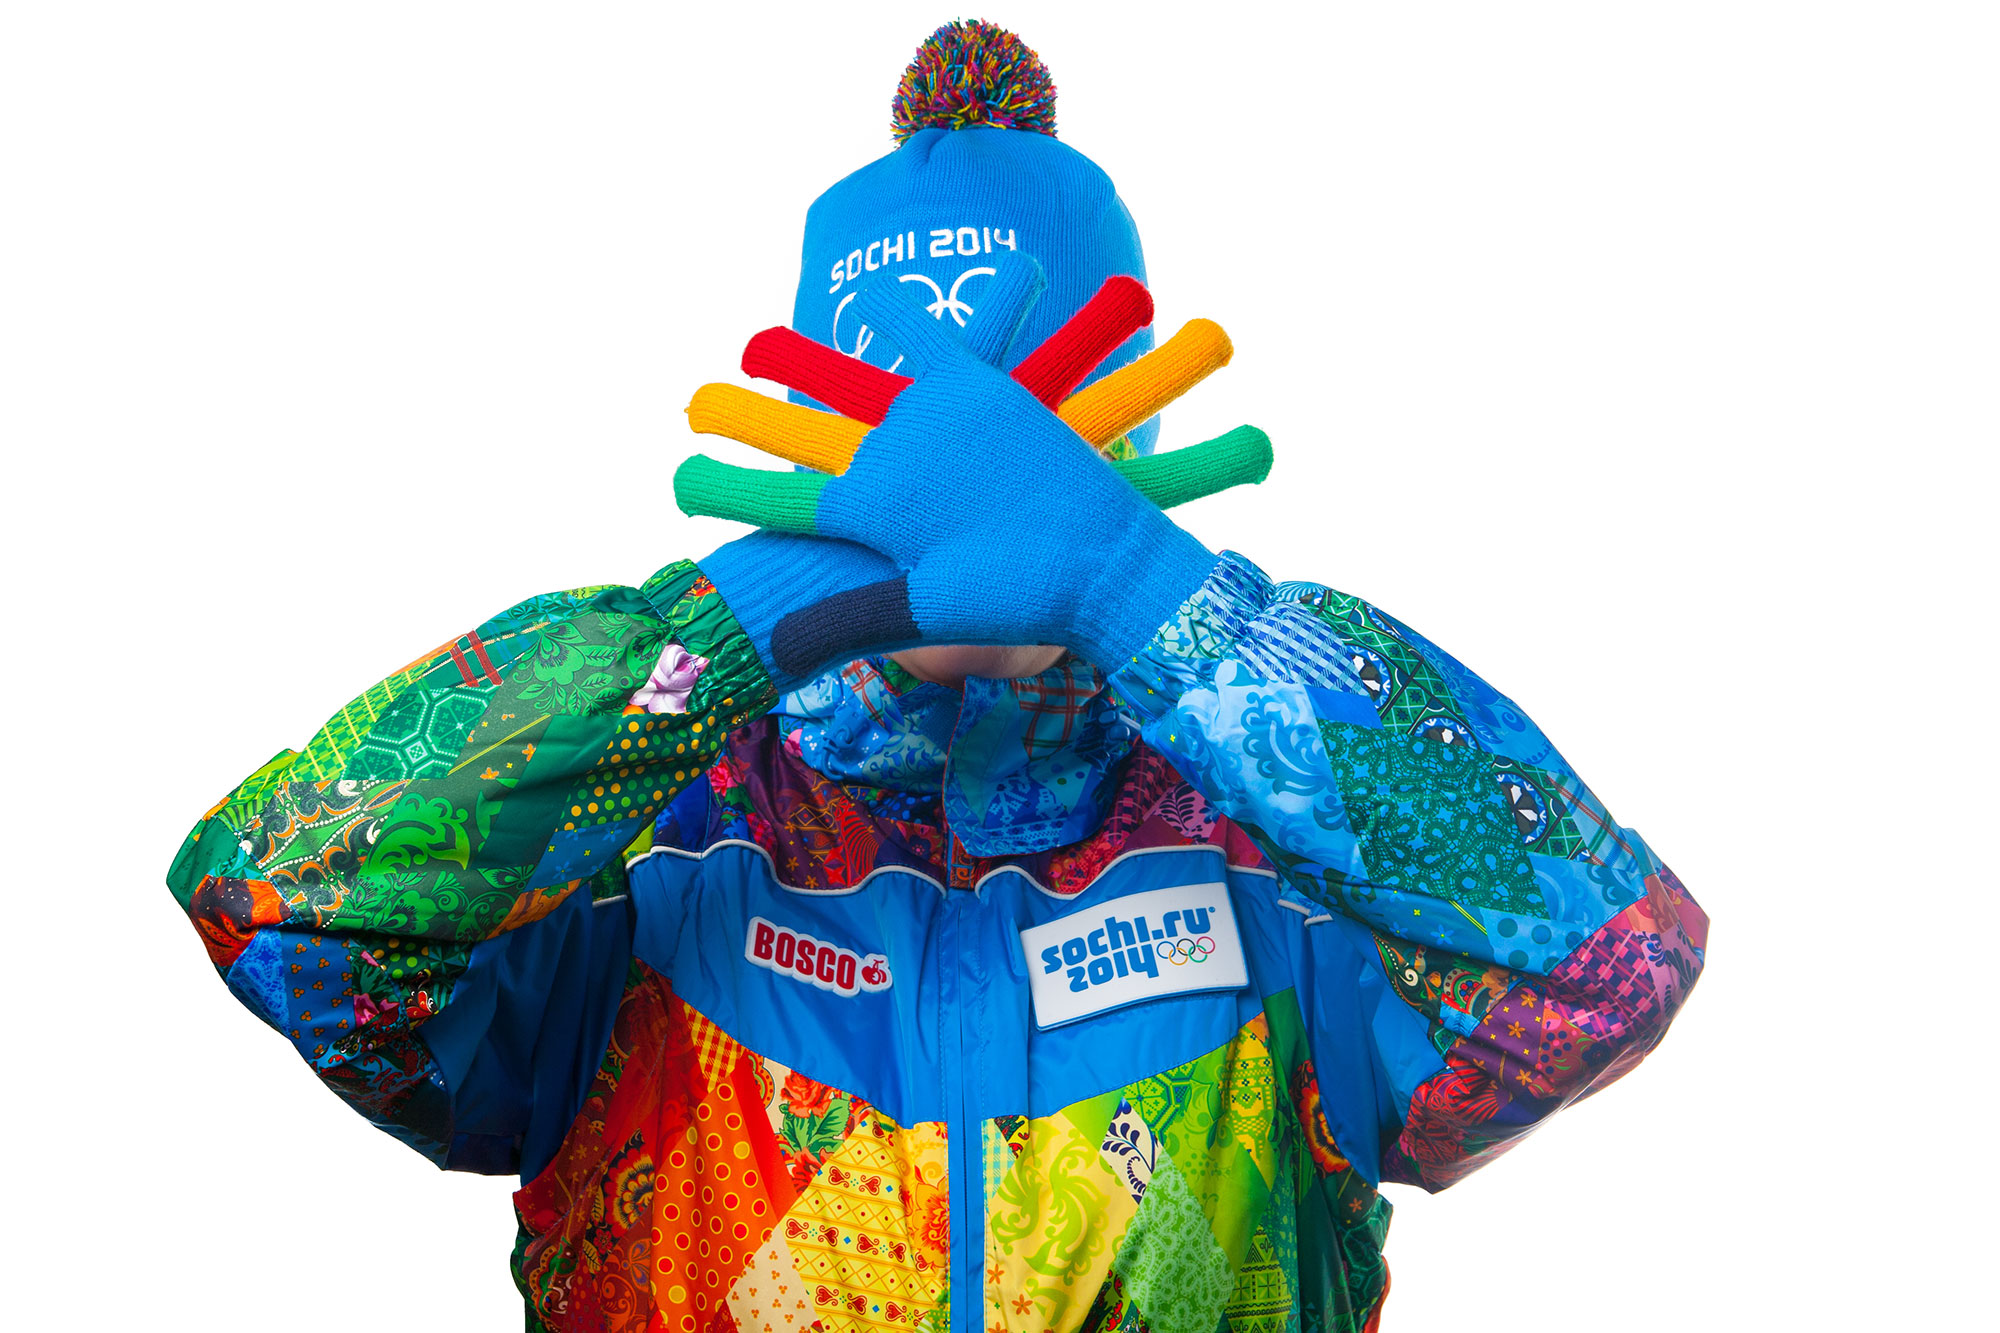 Winter Olympics Sochi Russia